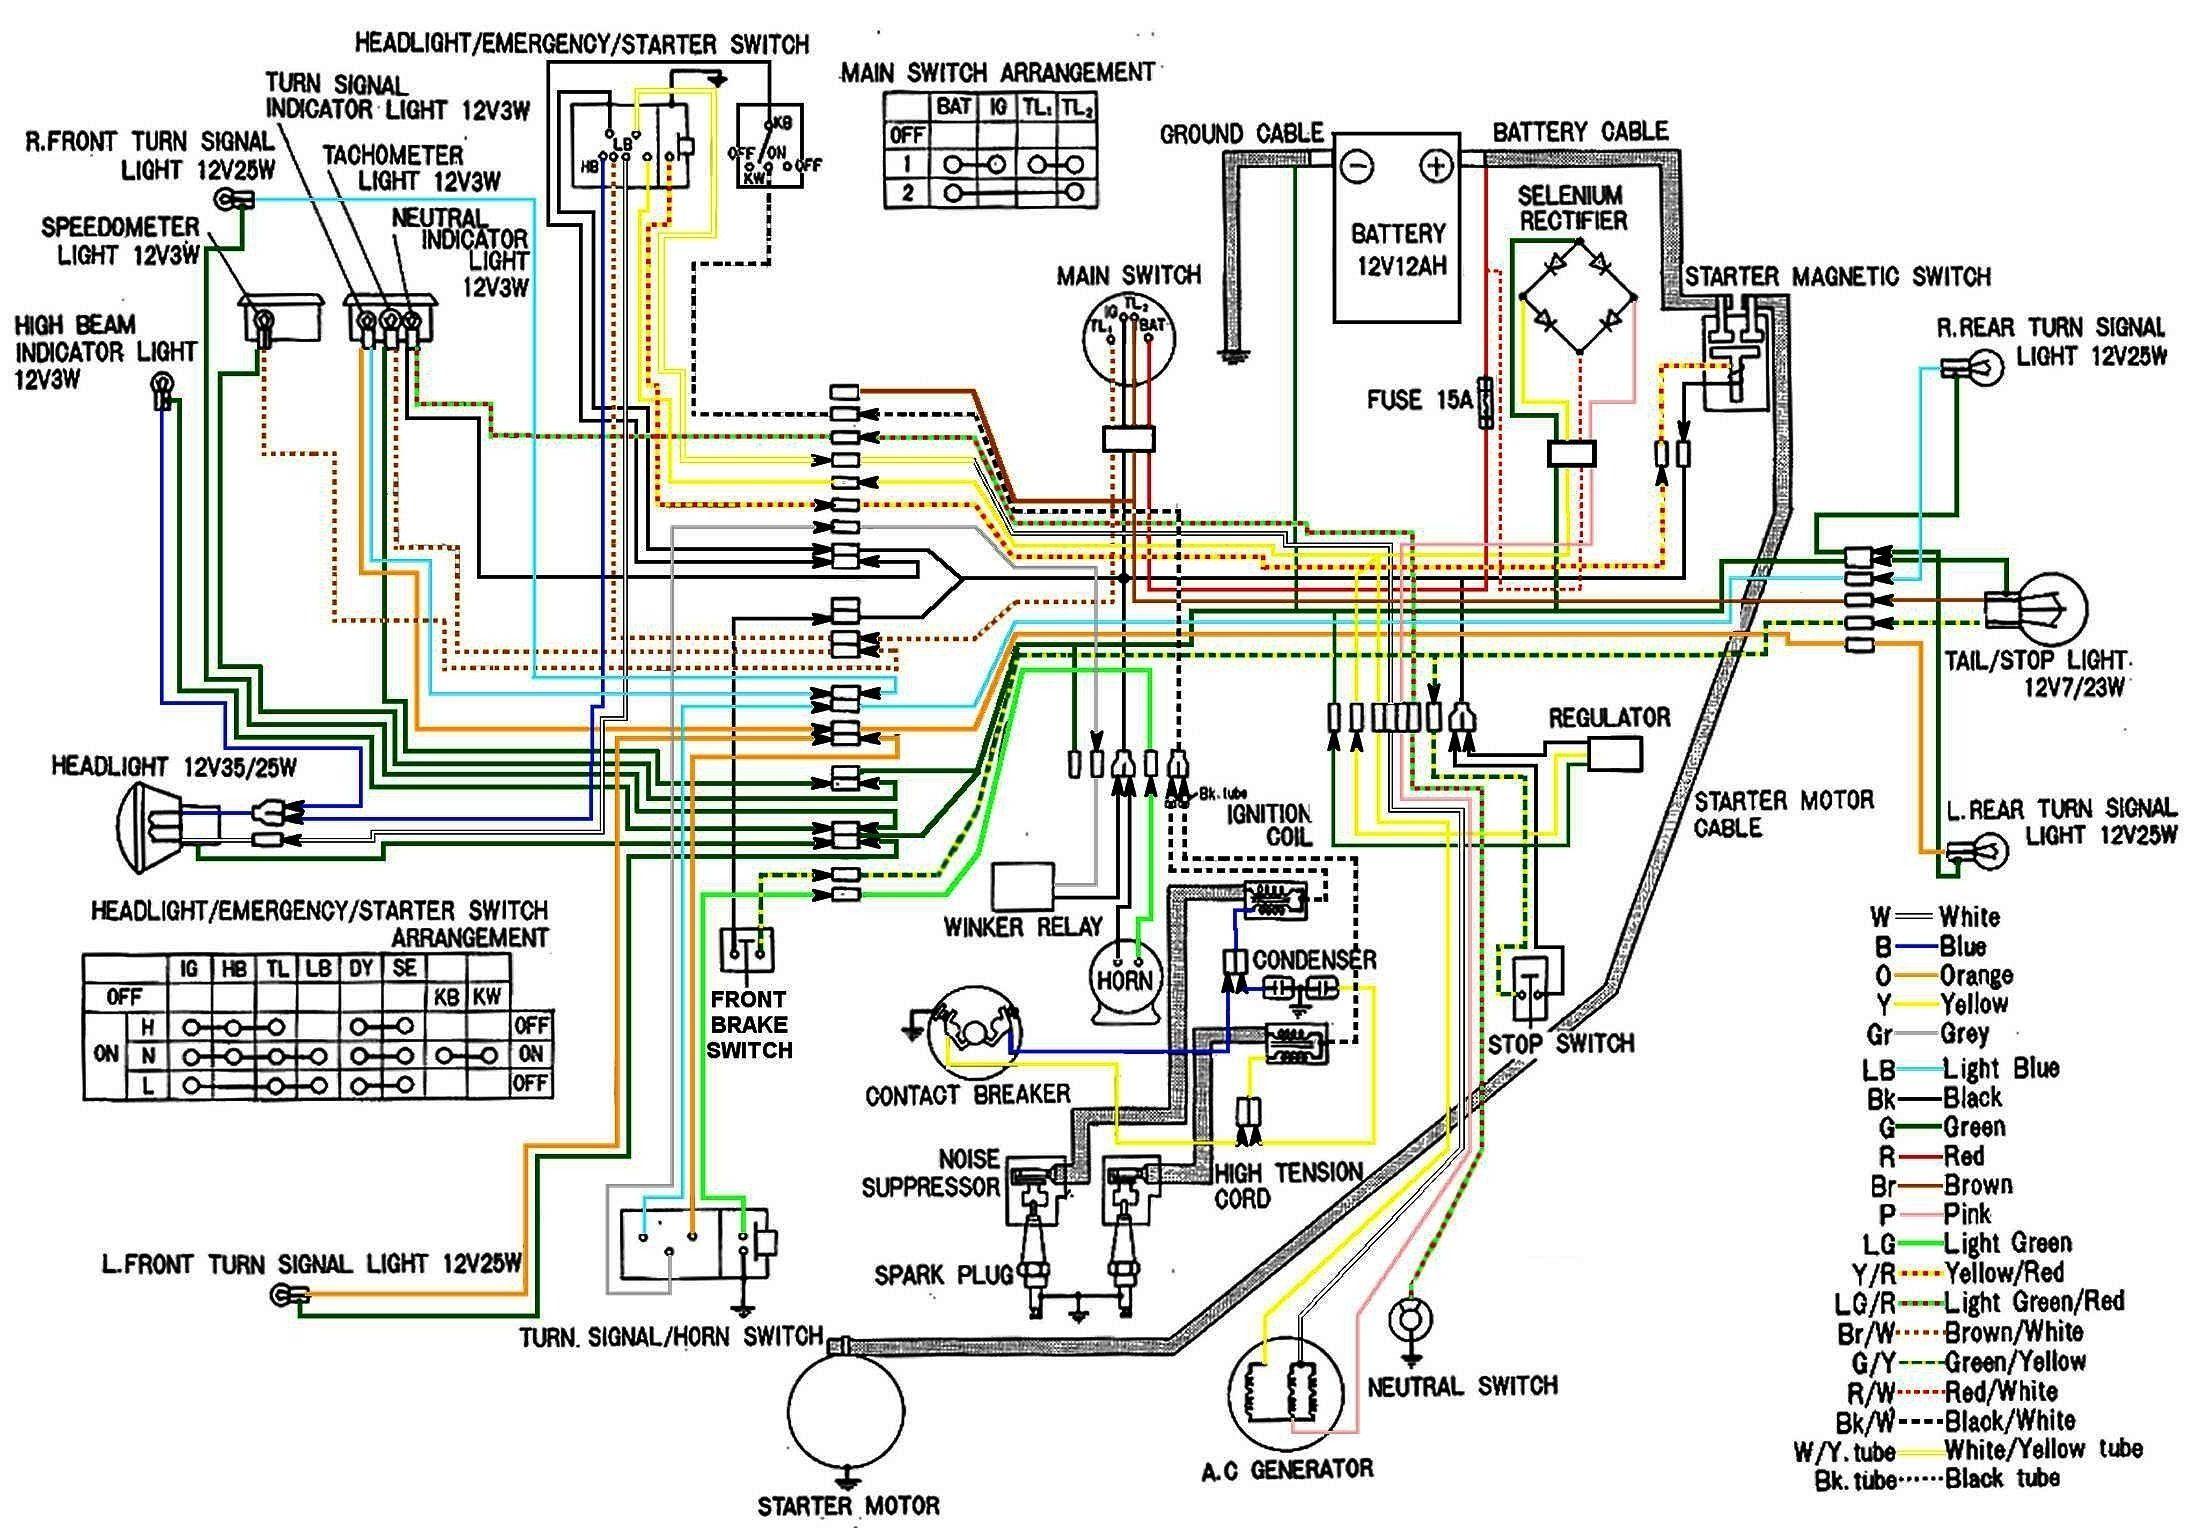 Plug Besides Cb360 Wiring Diagram On Honda Cb Wiring Diagrams Wire With Regard To Cb360 Wiring Diagram Electrical Wiring Diagram Diagram Electrical Wiring